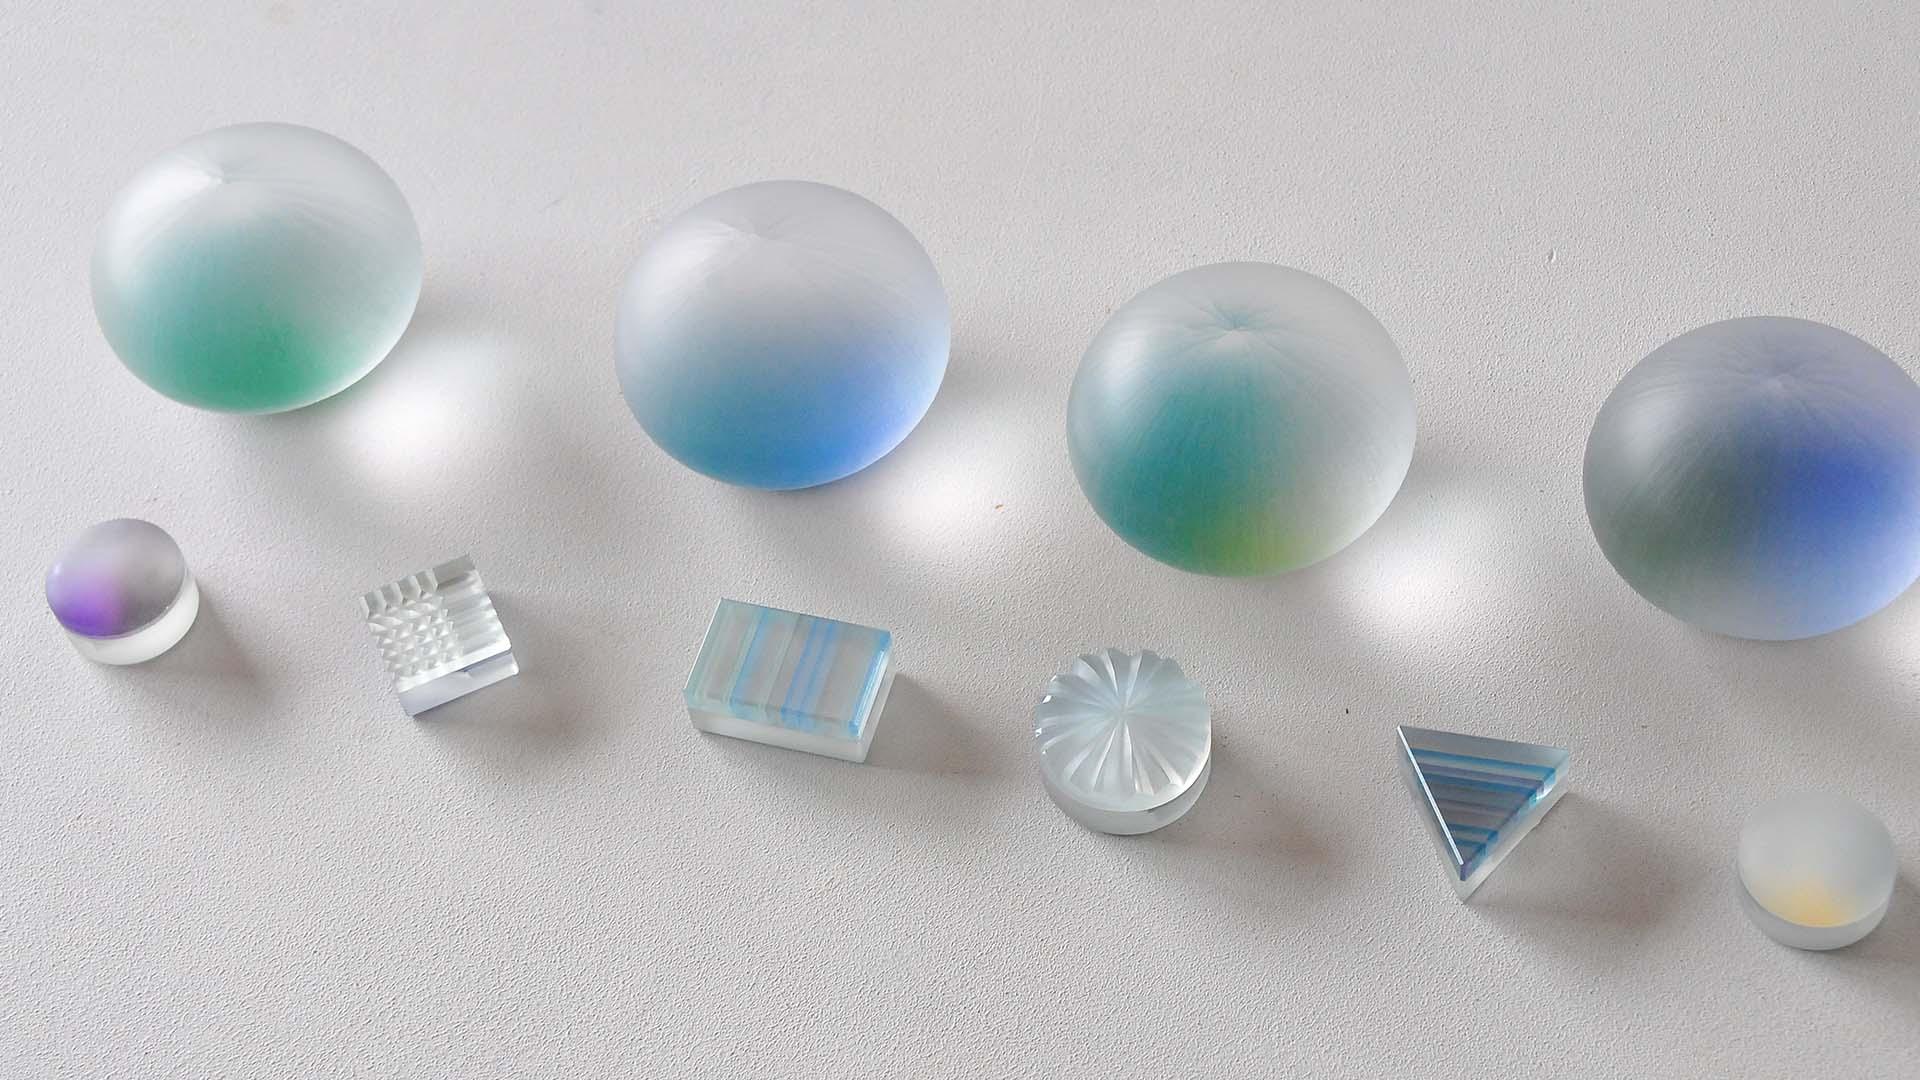 """matsurica"" GLASS ART EXHIBITION"